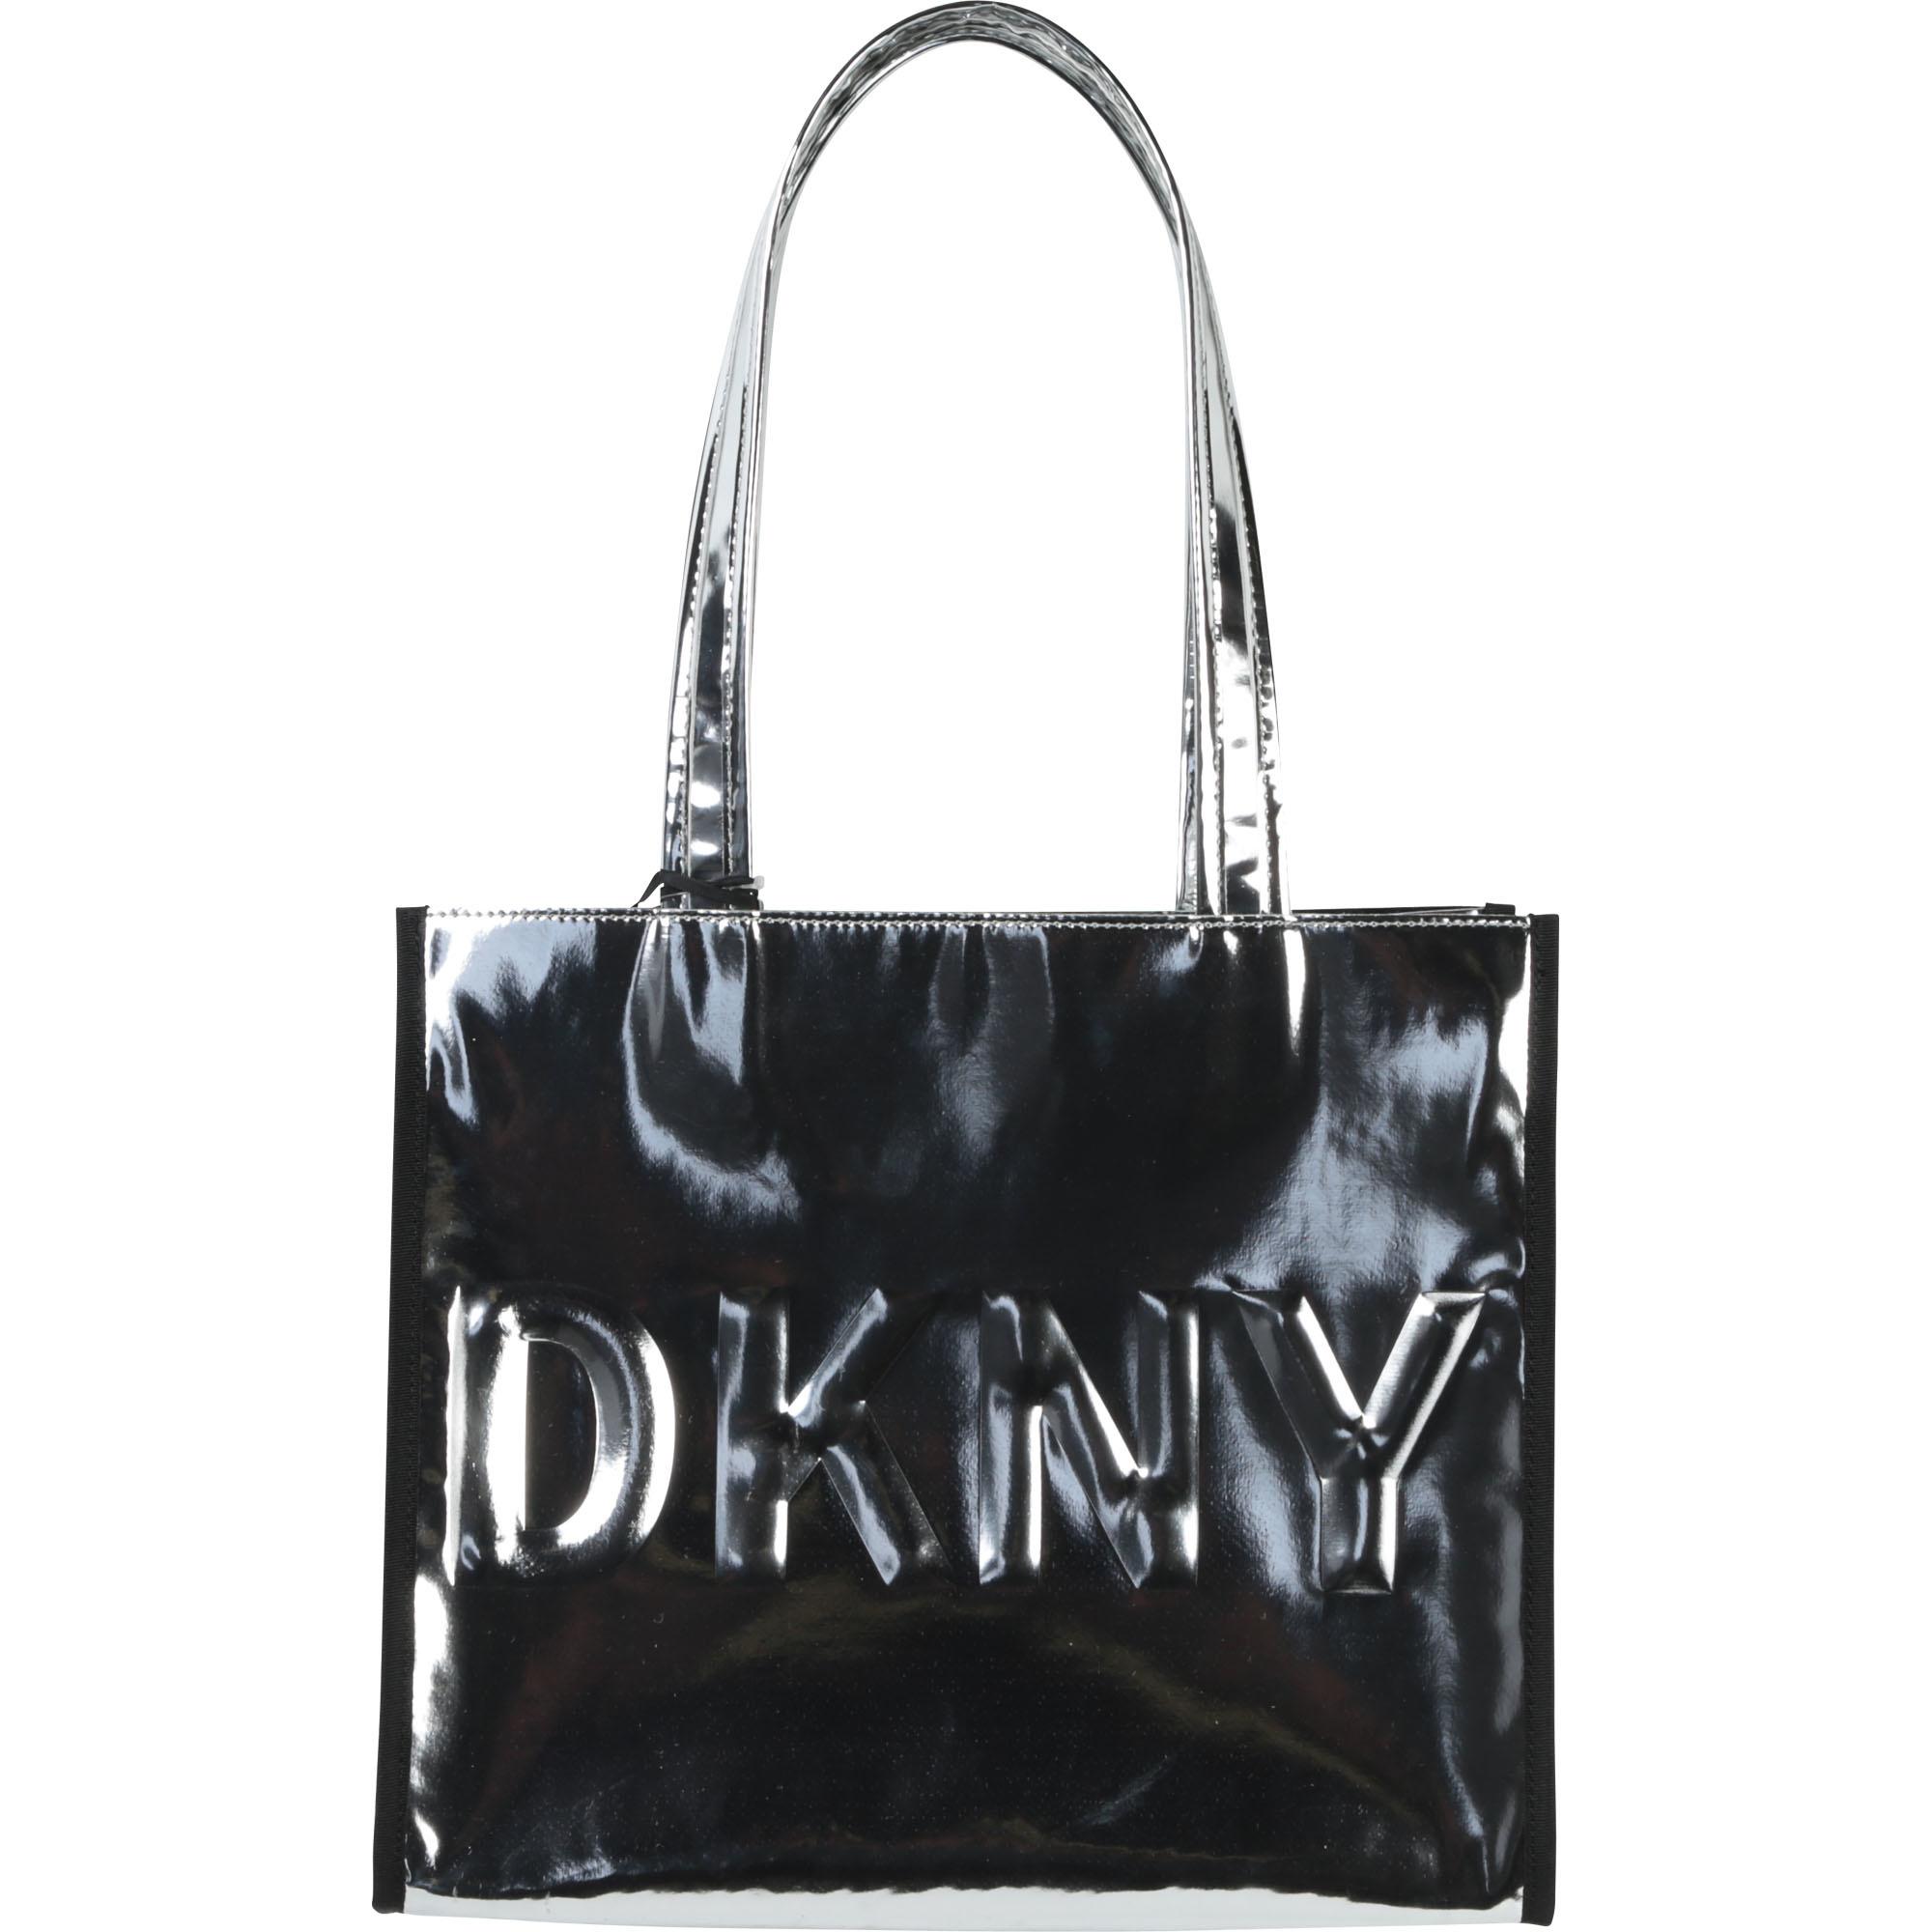 DKNY sac cabas effet miroir-1